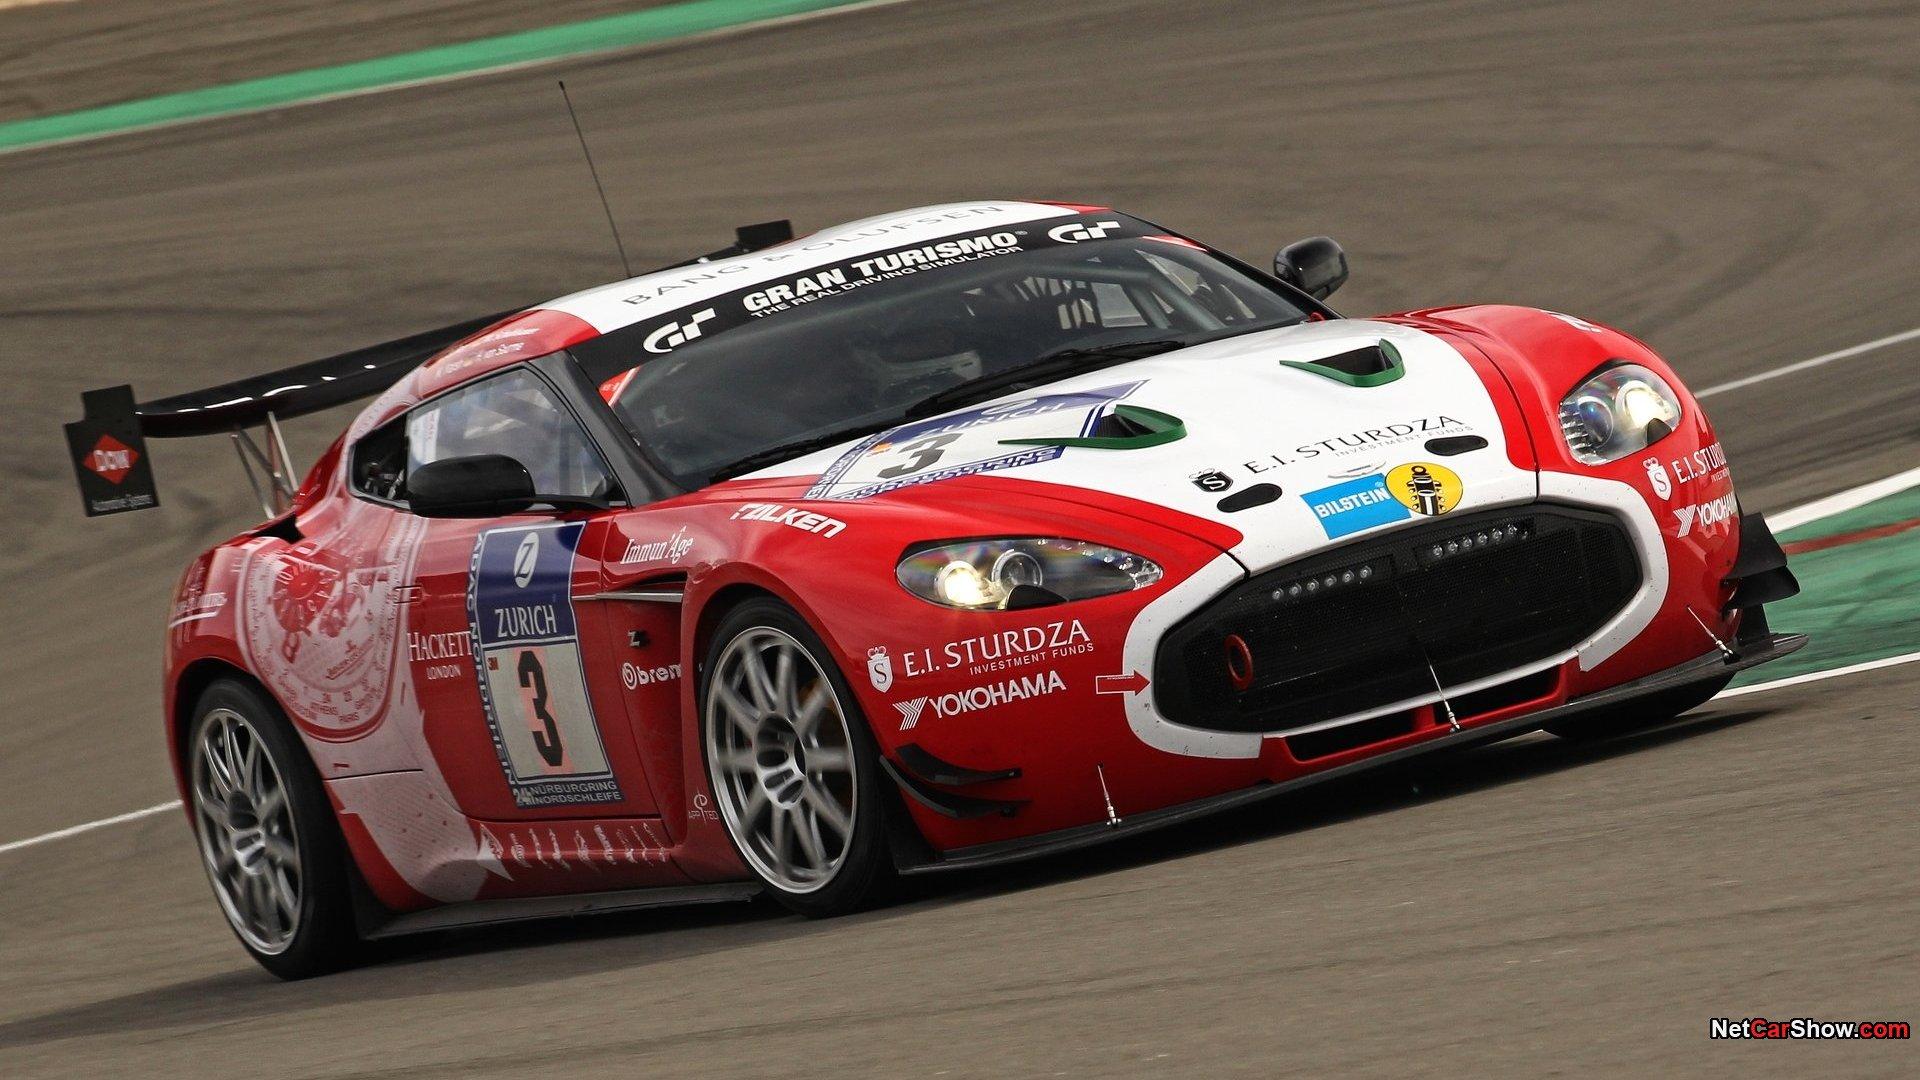 Aston Martin Zagato Race Car HD Wallpaper